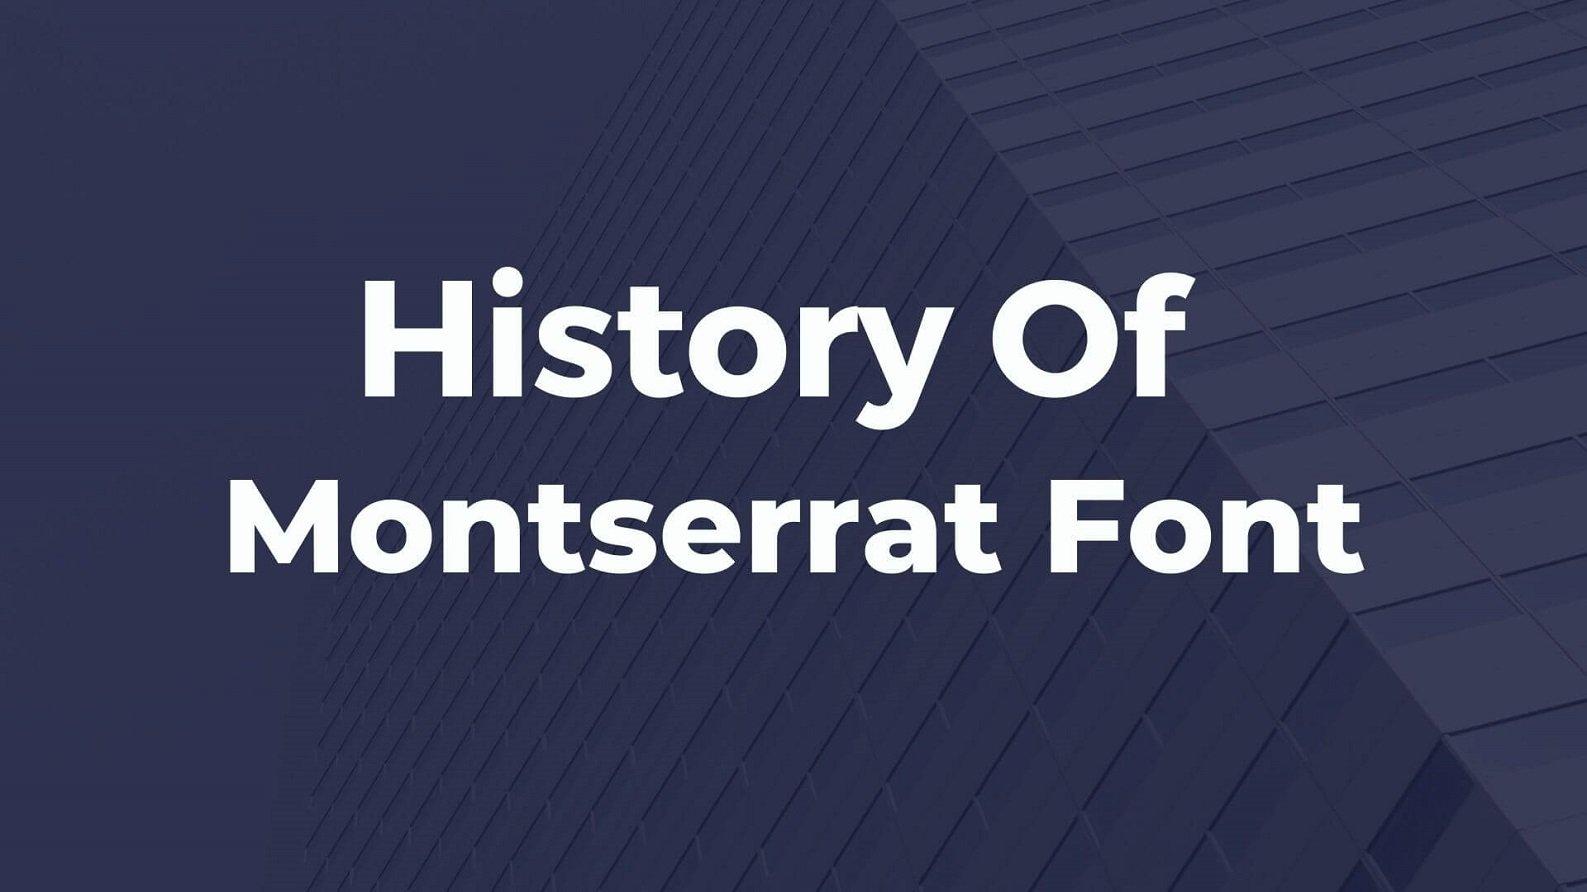 History of Montserrat Font